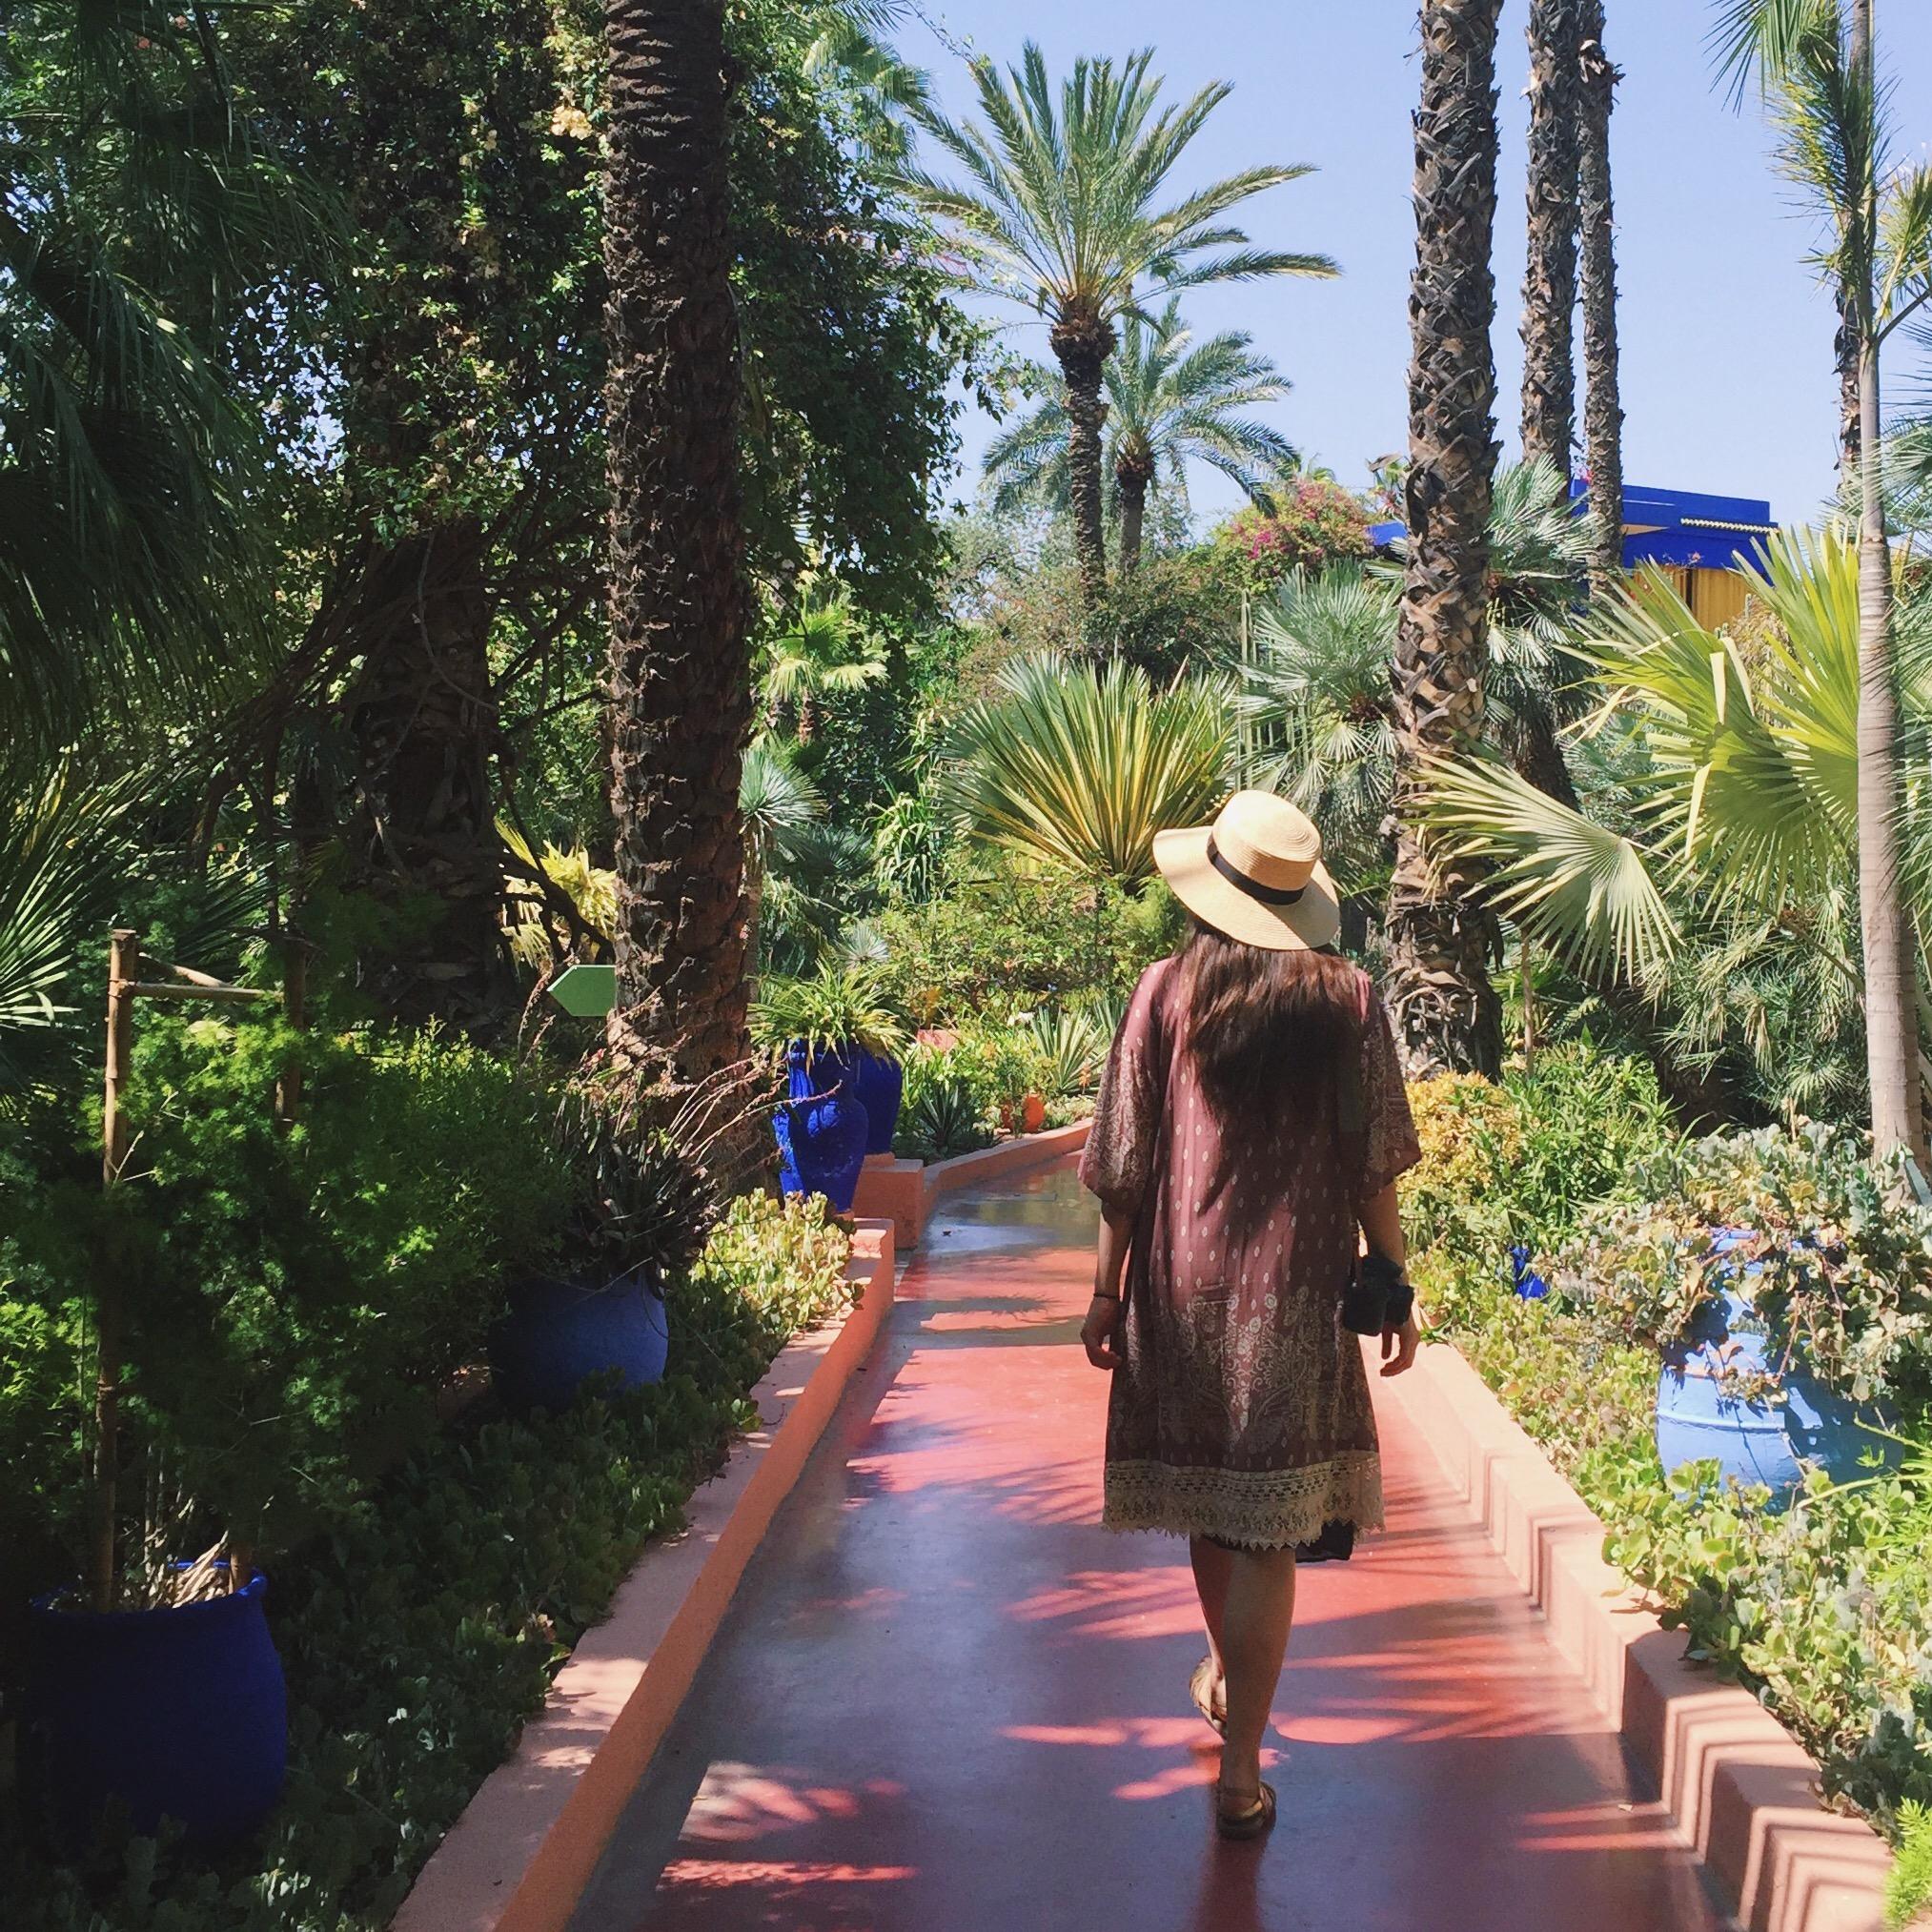 strolling through the gardens